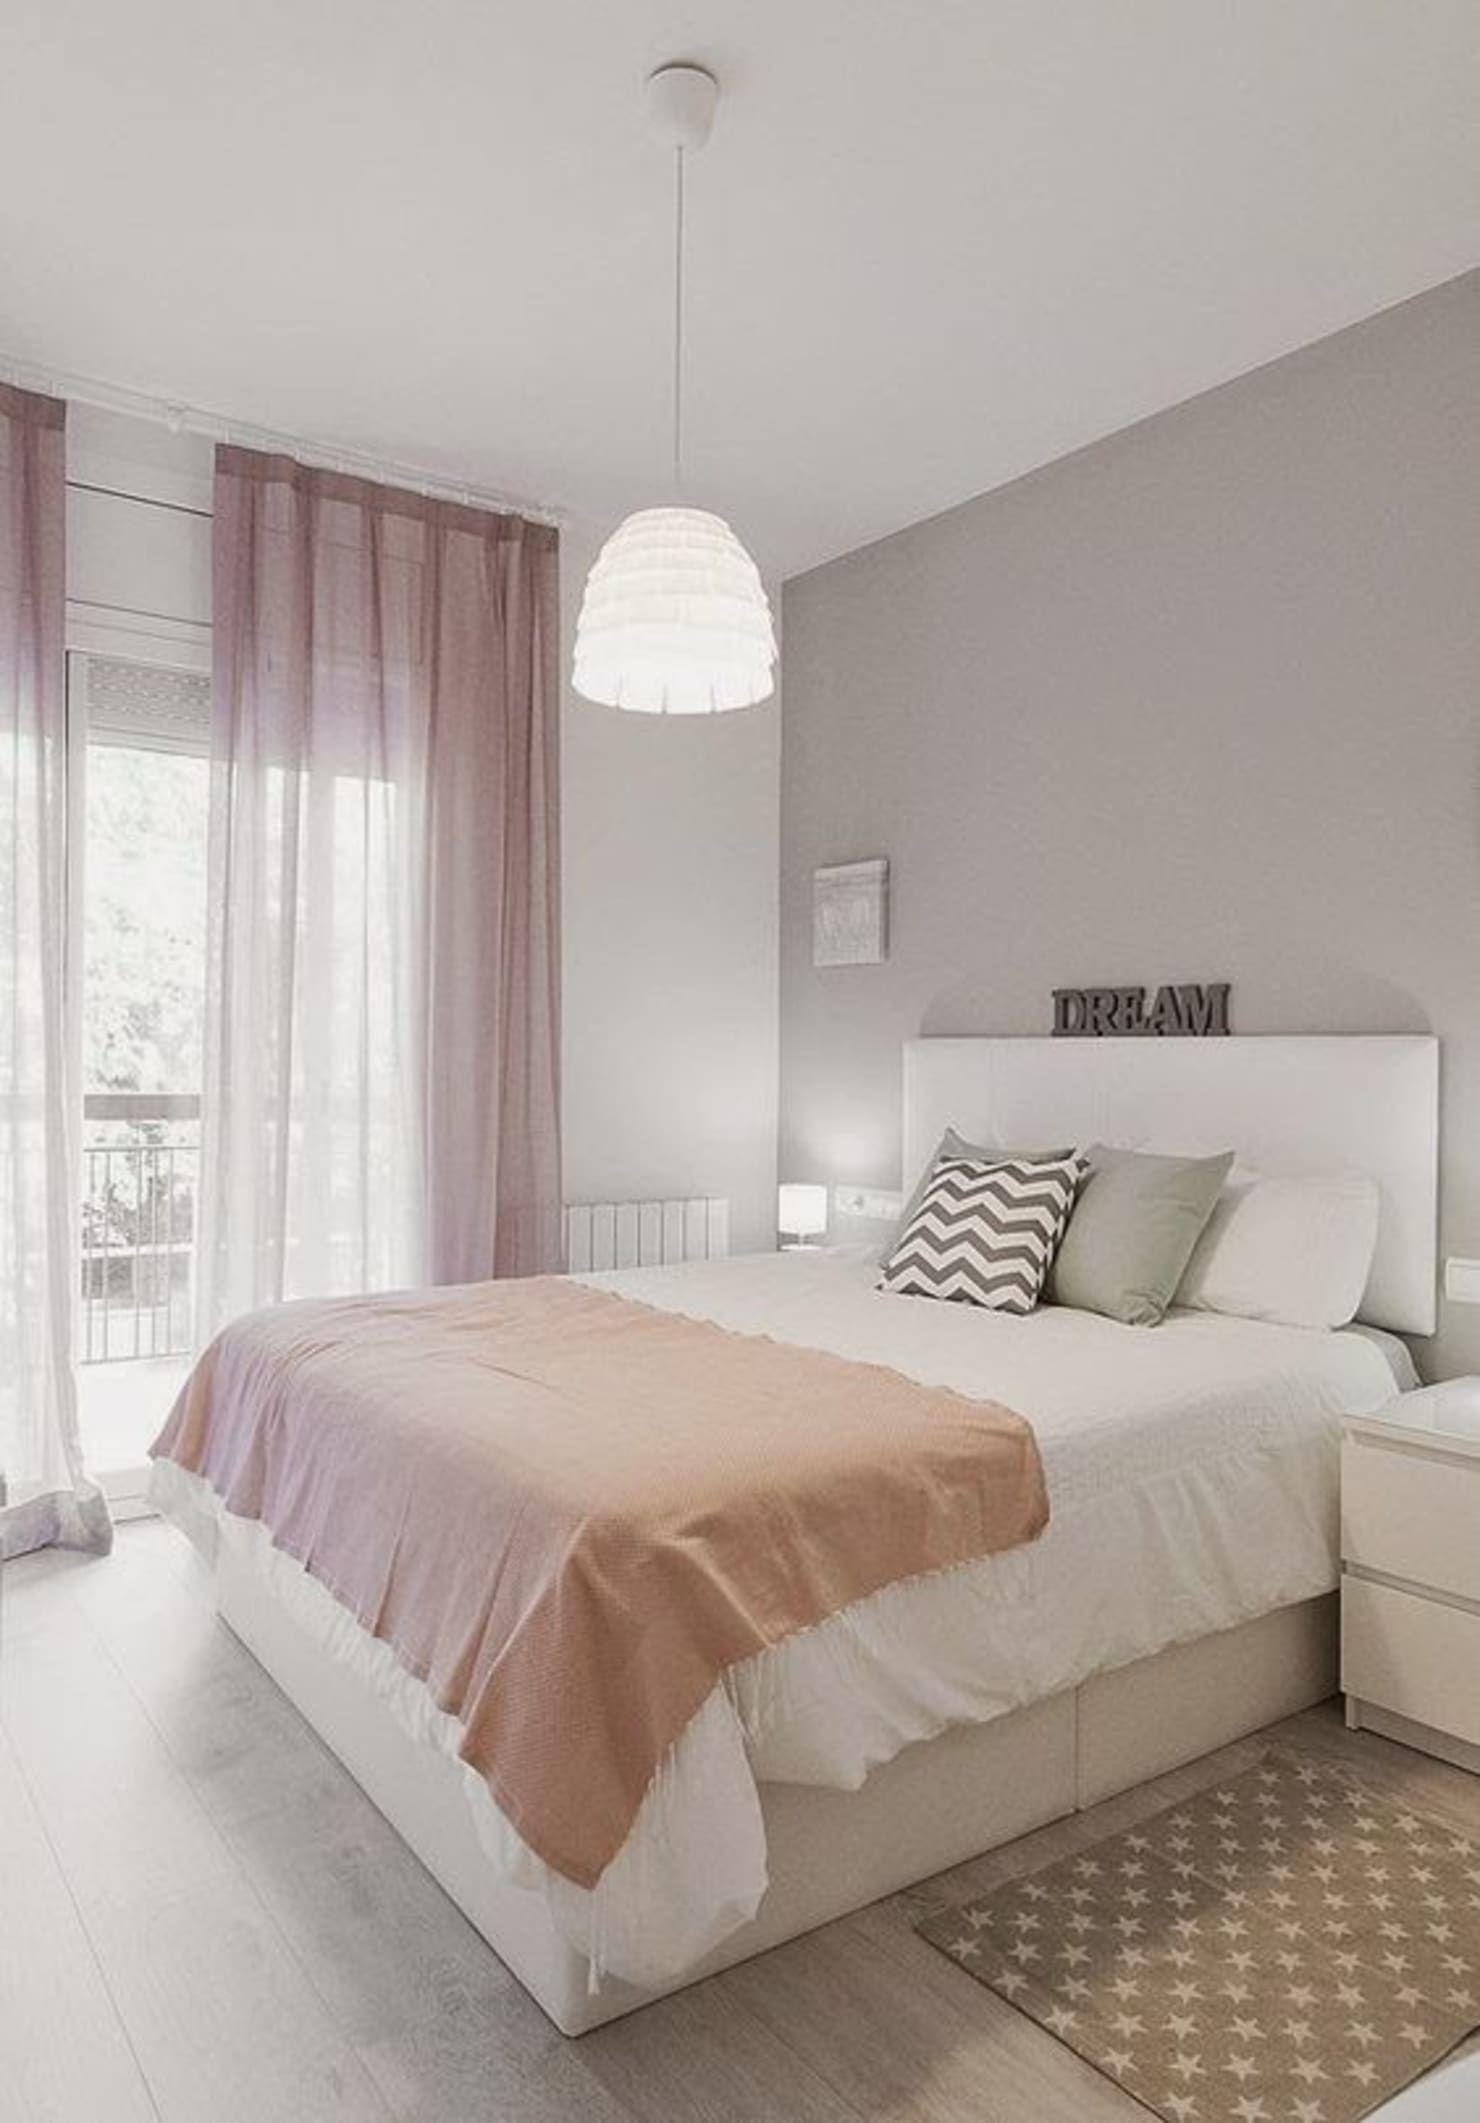 26+ Habitaciones rosas y grises inspirations